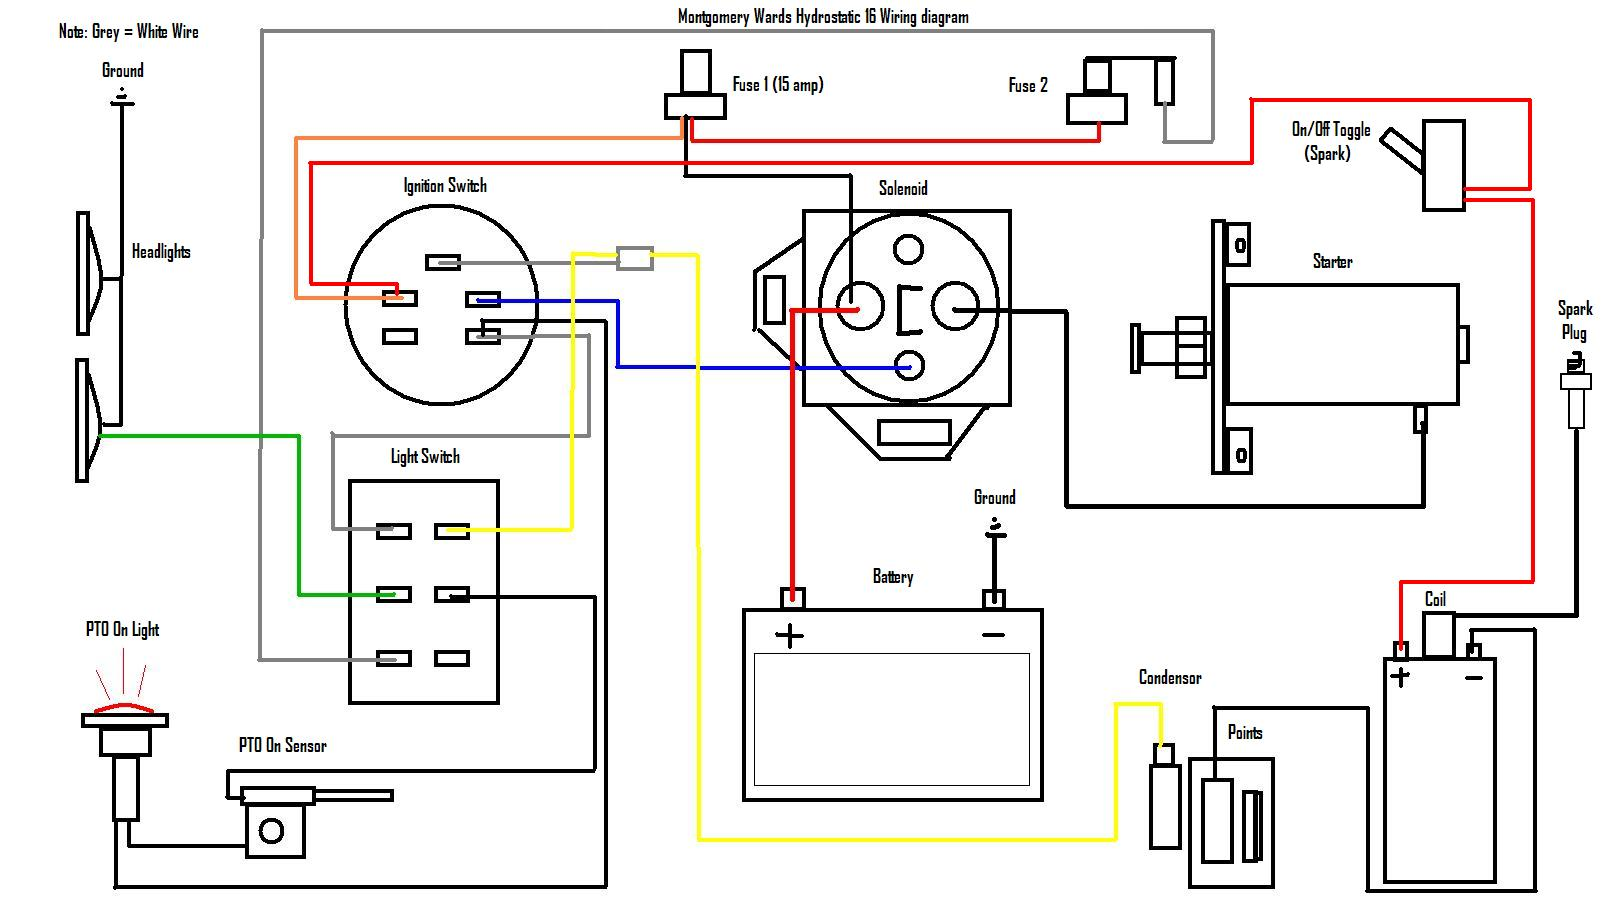 john deere 2150 wiring diagram, john deere 50 wiring diagram, john deere 970 wiring diagram, john deere 670 wiring diagram, john deere 4400 wiring diagram, john deere 5210 wiring diagram, john deere 655 wiring diagram, john deere 320 wiring diagram, john deere 4000 wiring diagram, john deere 350 wiring diagram, john deere 1250 wiring diagram, john deere 5200 wiring diagram, john deere 2550 wiring diagram, john deere 1070 wiring diagram, john deere 80 wiring diagram, john deere solenoid wiring diagram, john deere 5020 wiring diagram, john deere 850 wiring diagram, john deere 70 wiring diagram, john deere 330 wiring diagram, on 770 john deere starter wiring diagram